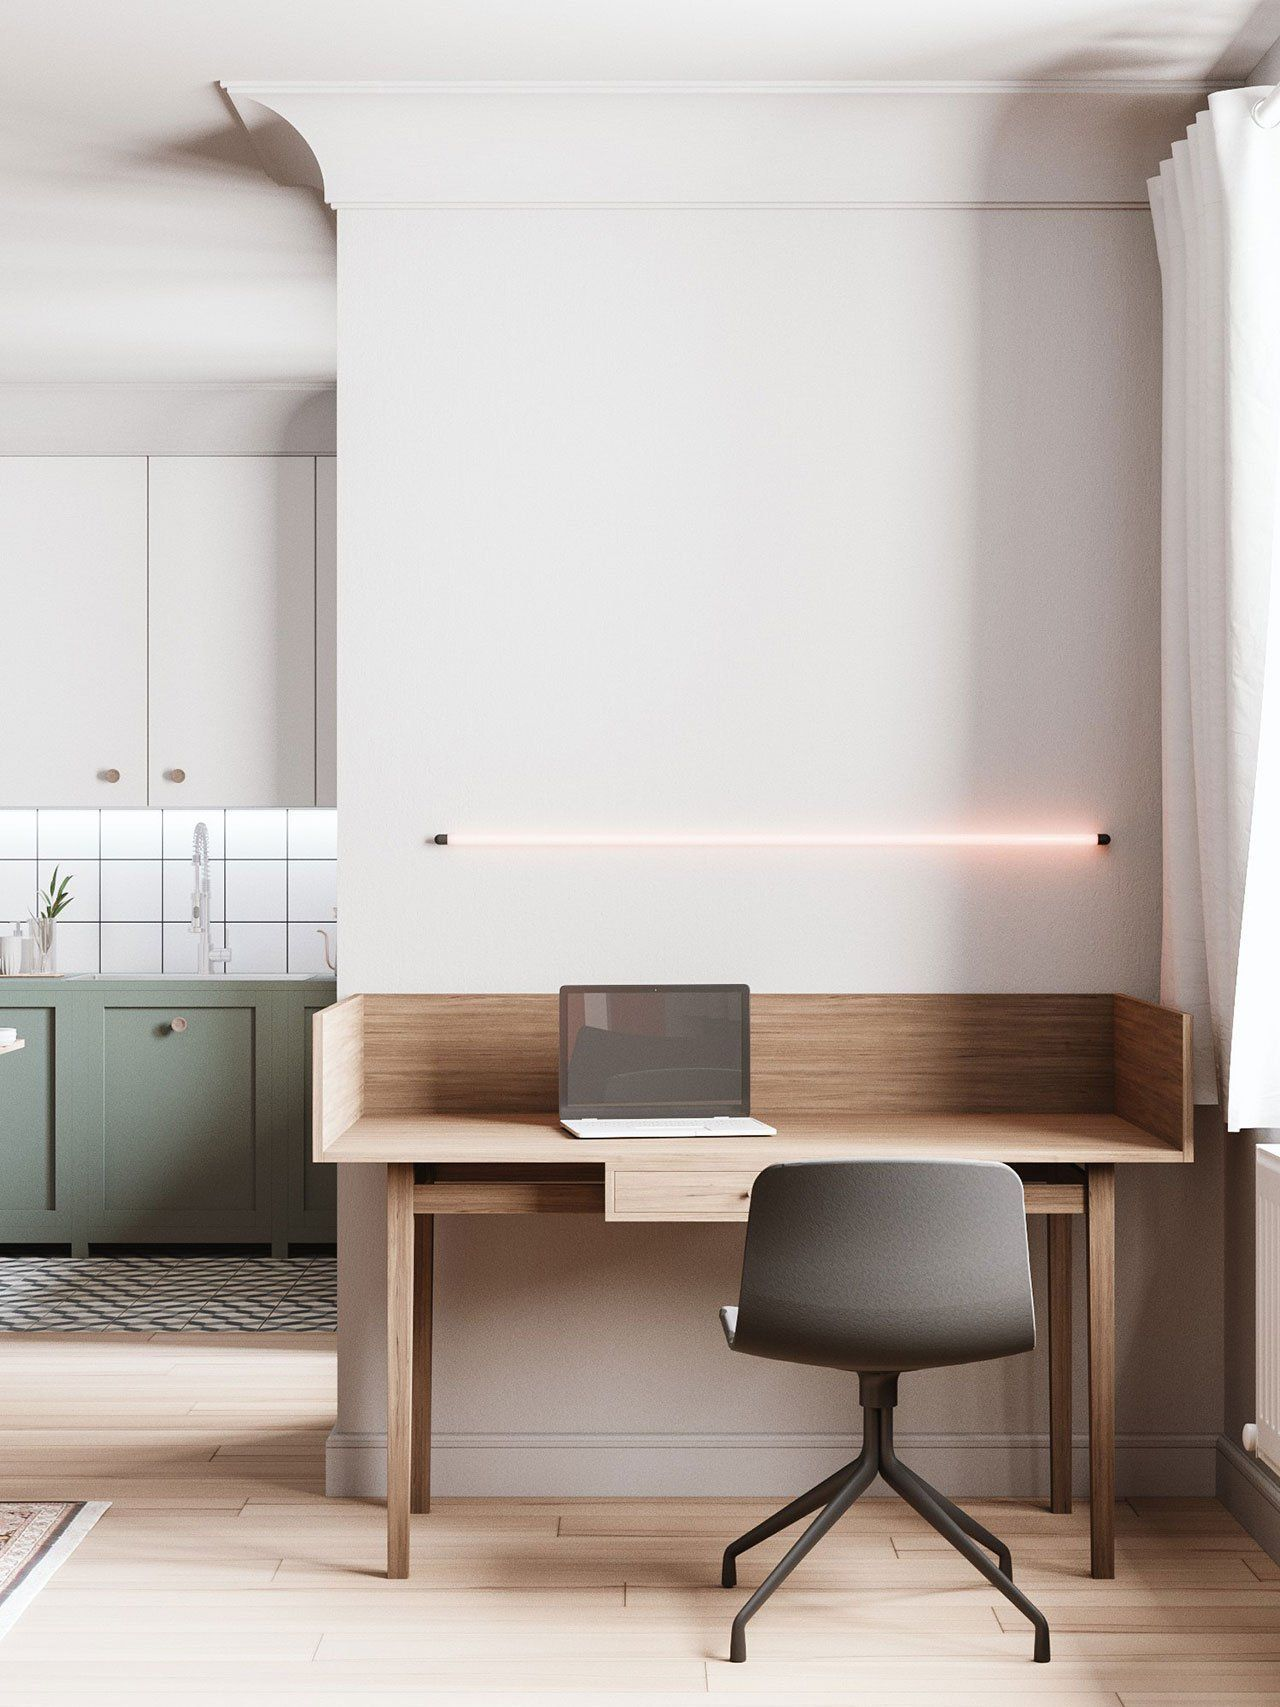 Minimalist Apartment Design Ideas #Minimalistapartment